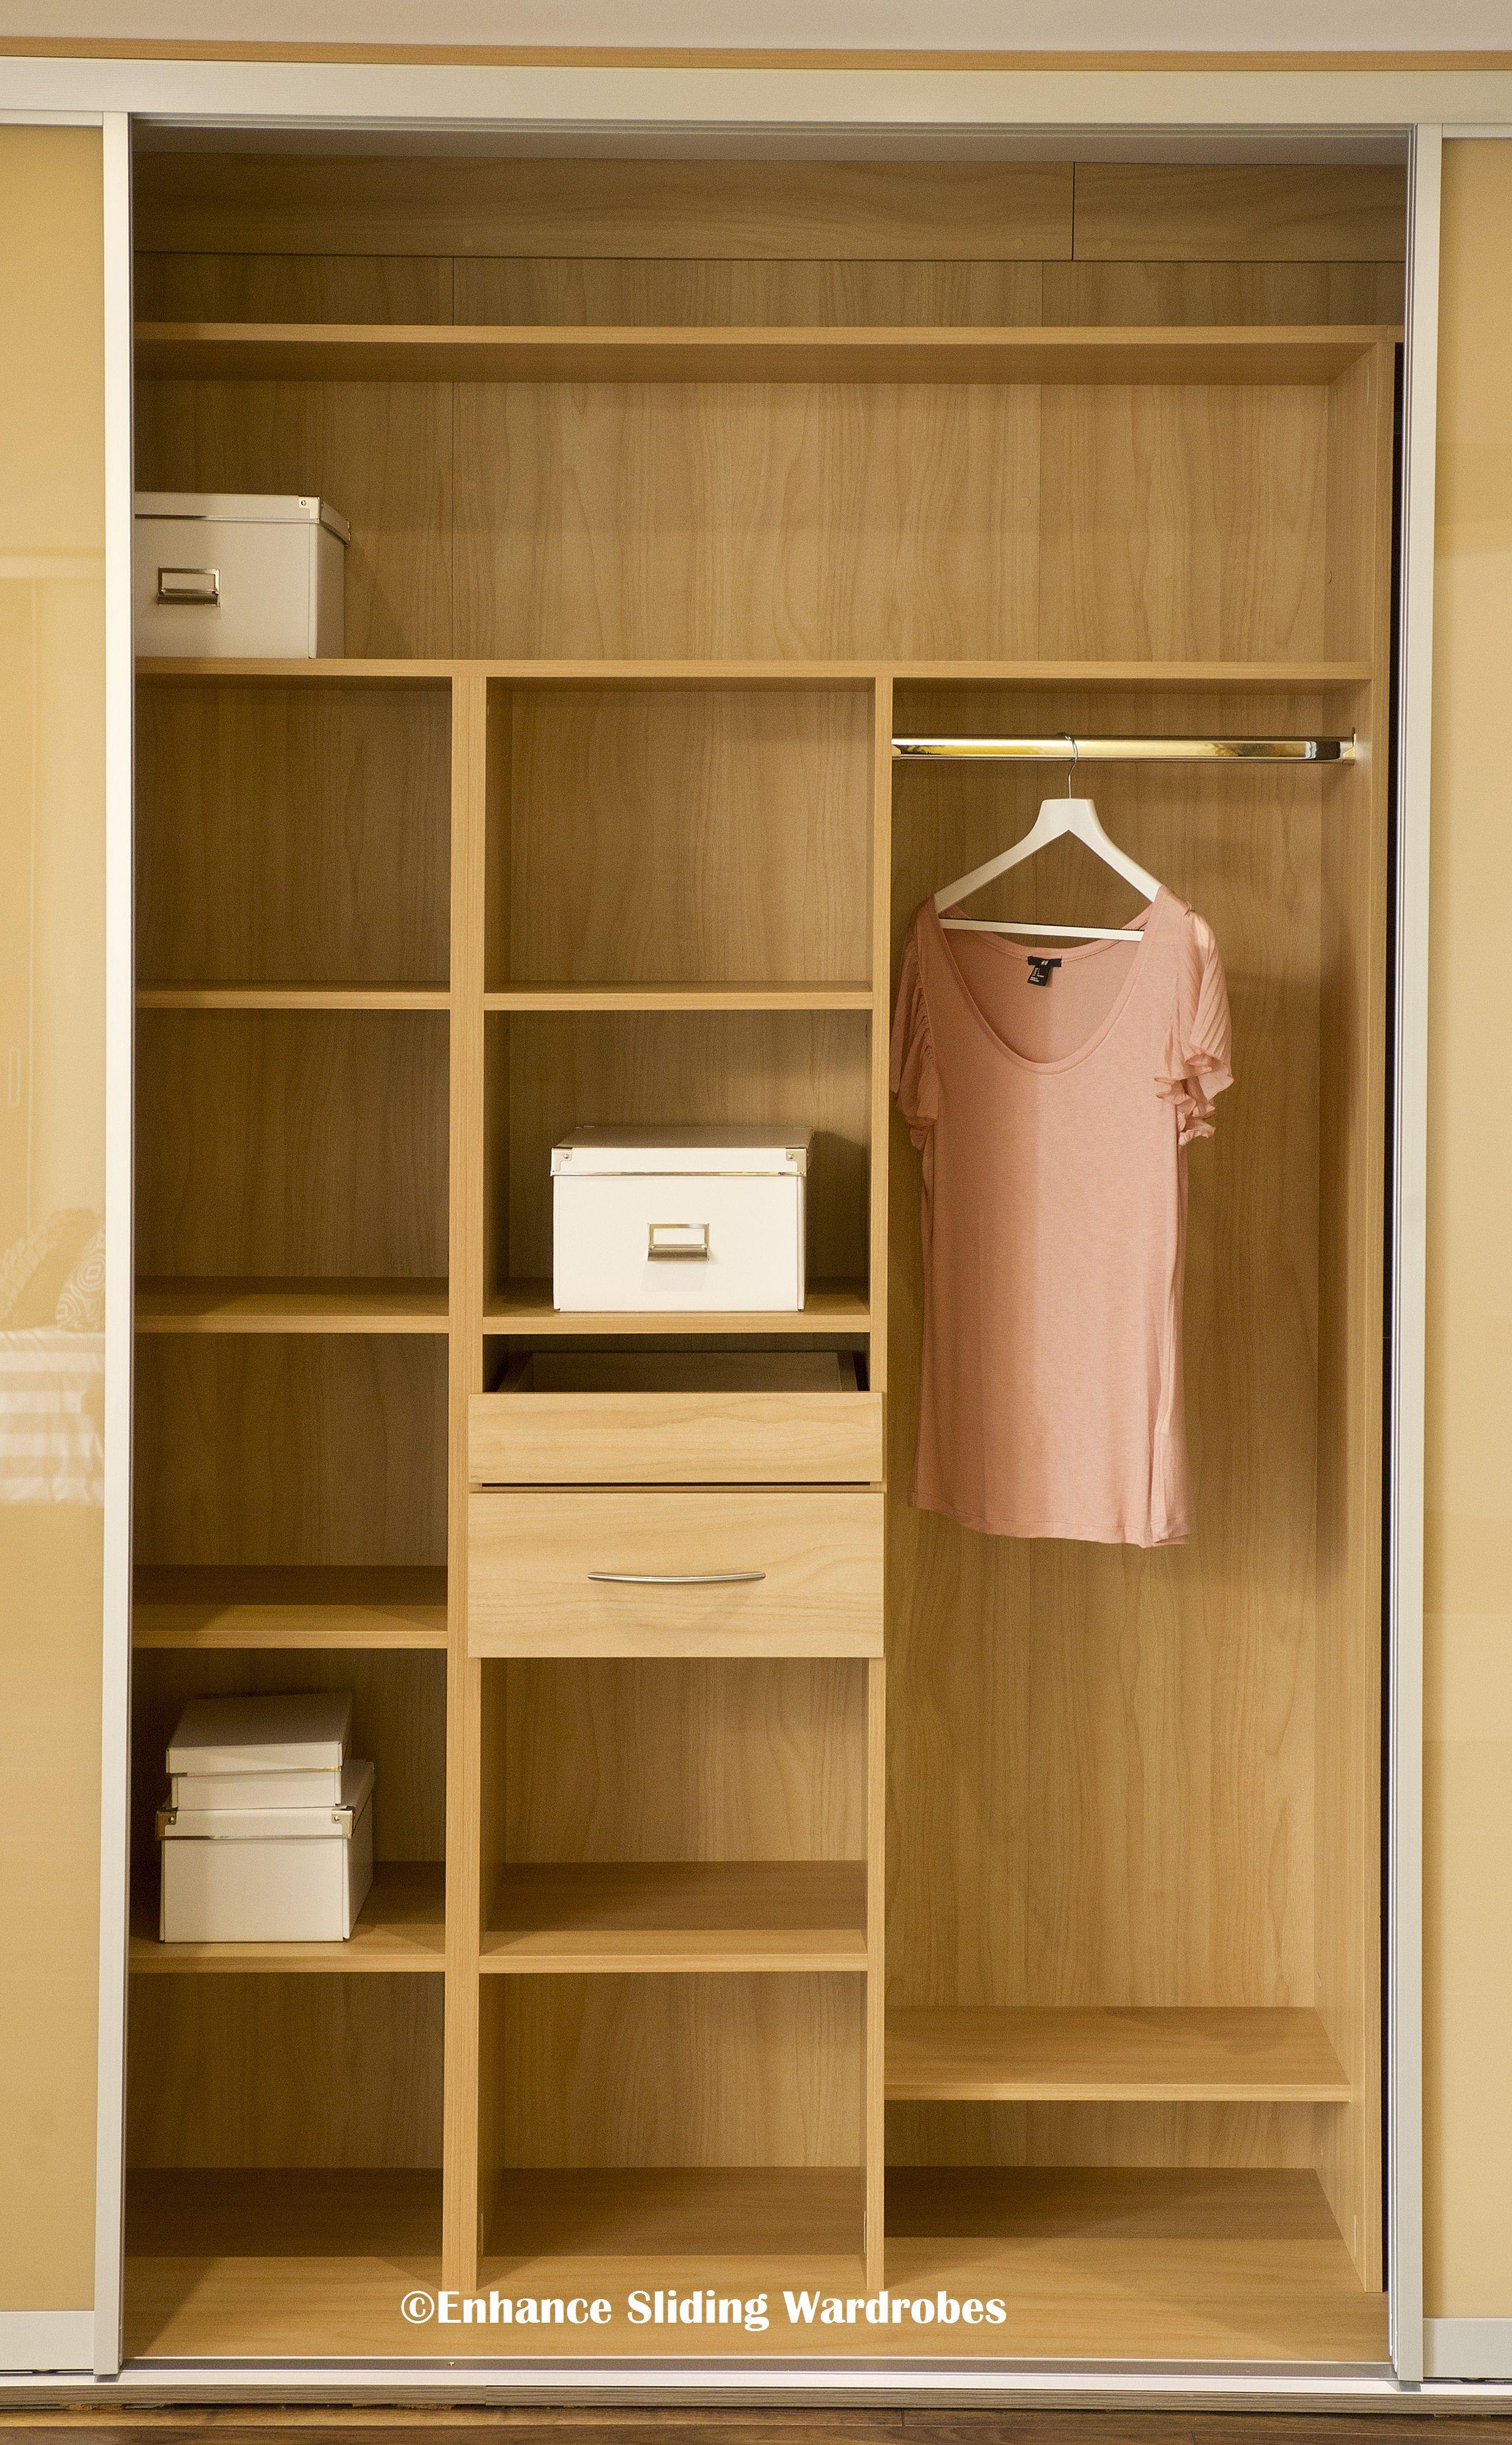 Oak interiors for fitted wardrobe closet storage - Wardrobe interior designs for bedroom ...